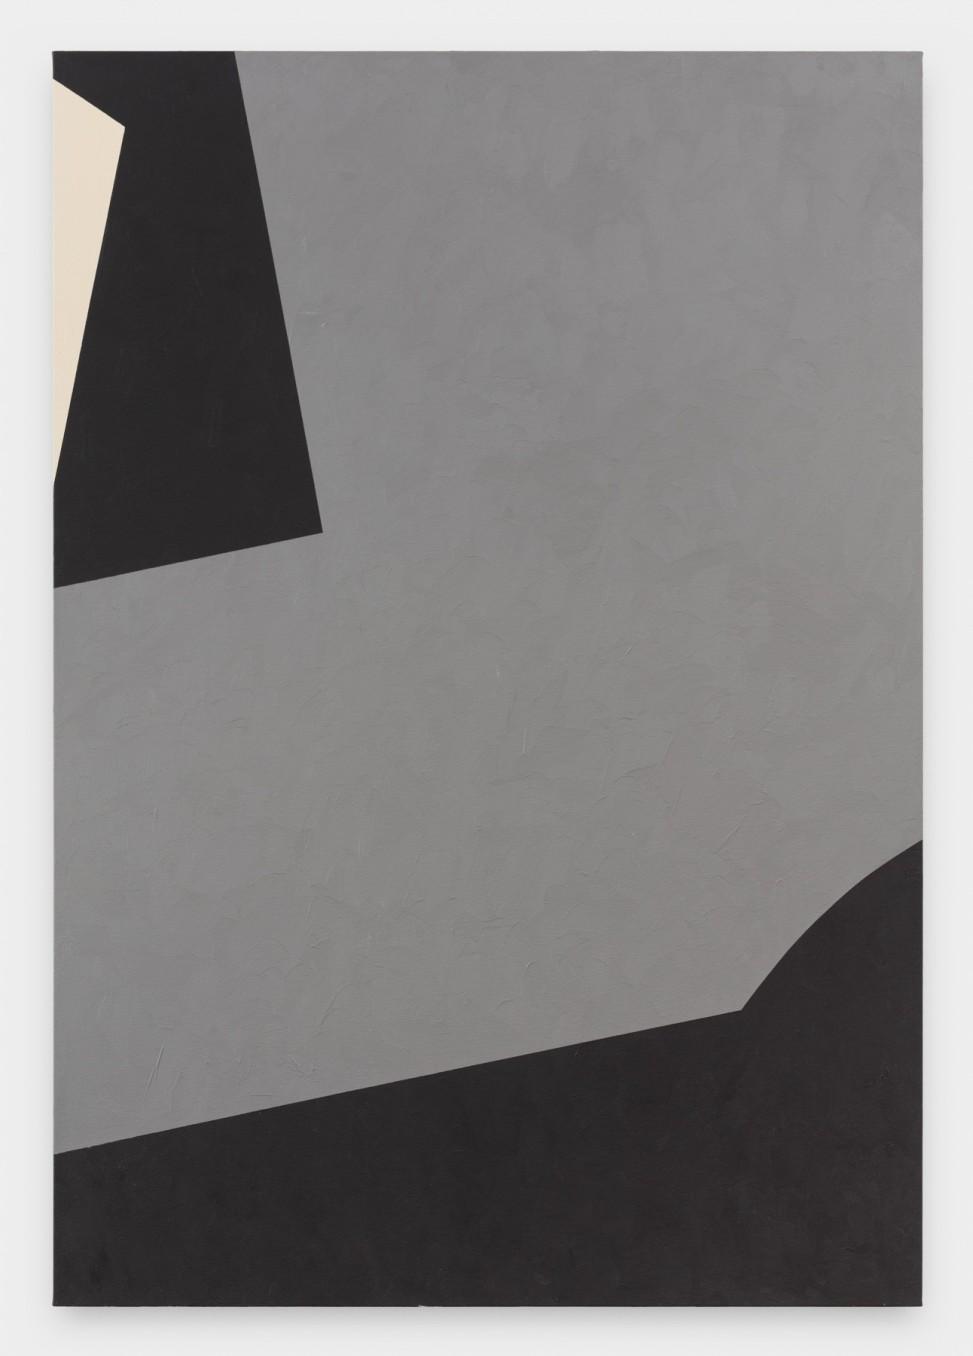 Virginia Jaramillo, Site: No. 6 13.5320° S, 71.9675° W, 2018, Acrylic on canvas, 198.1 x 137.2 cm, 78 x 54 in